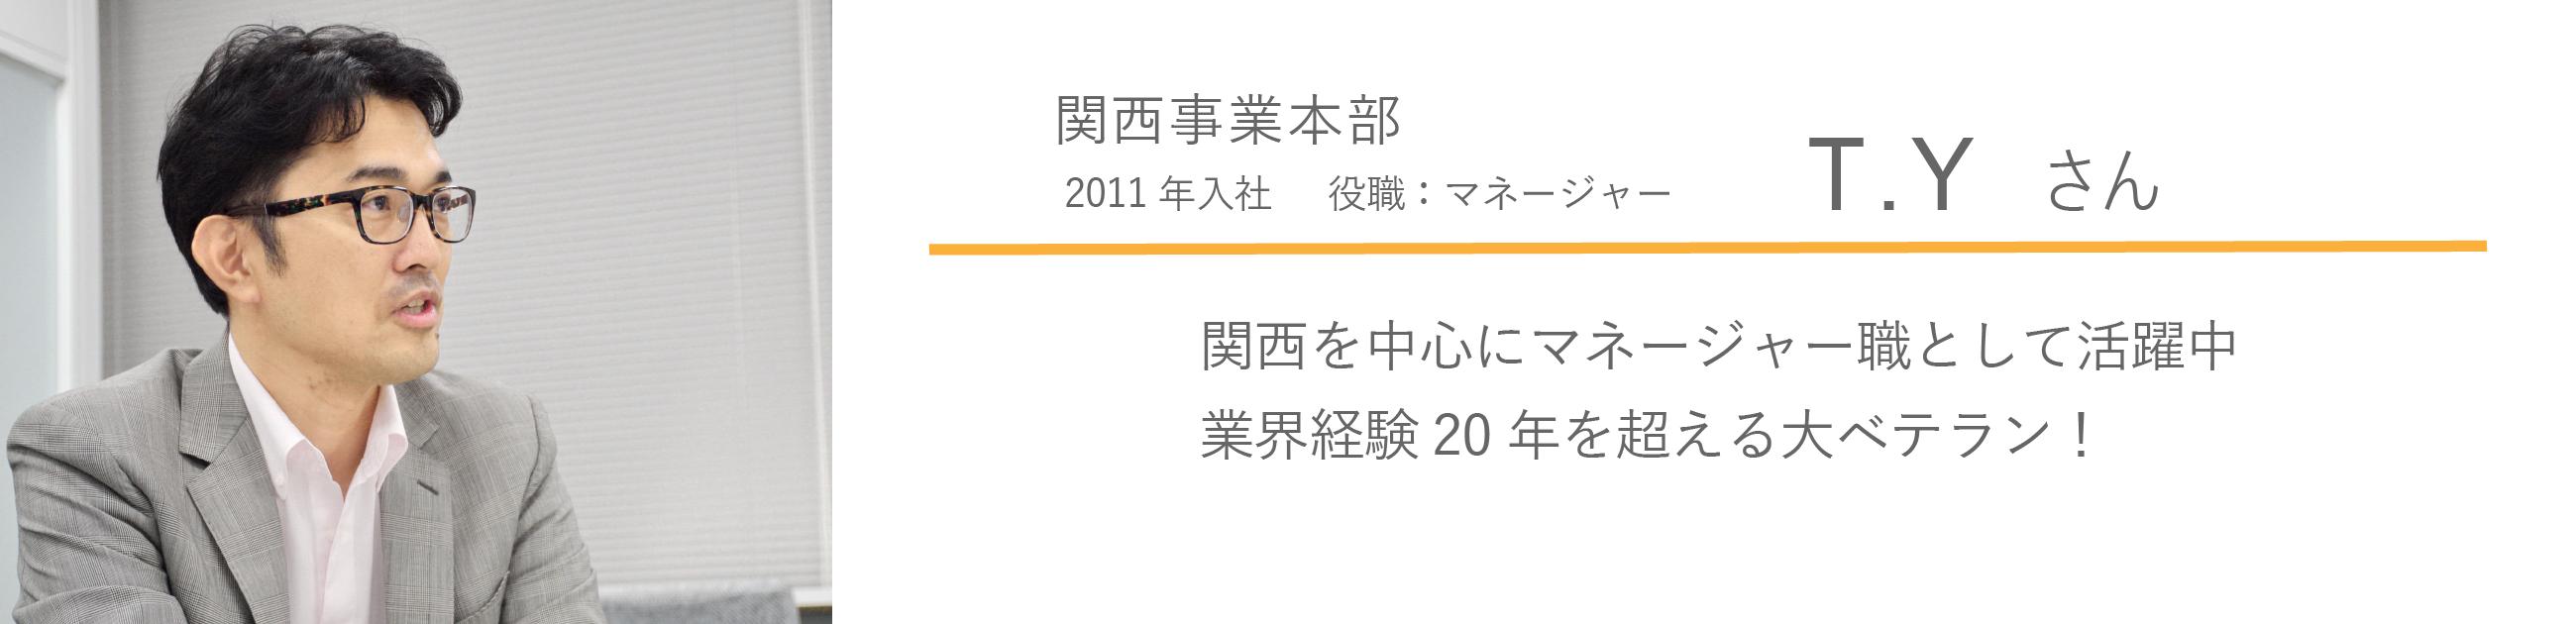 社員紹介6